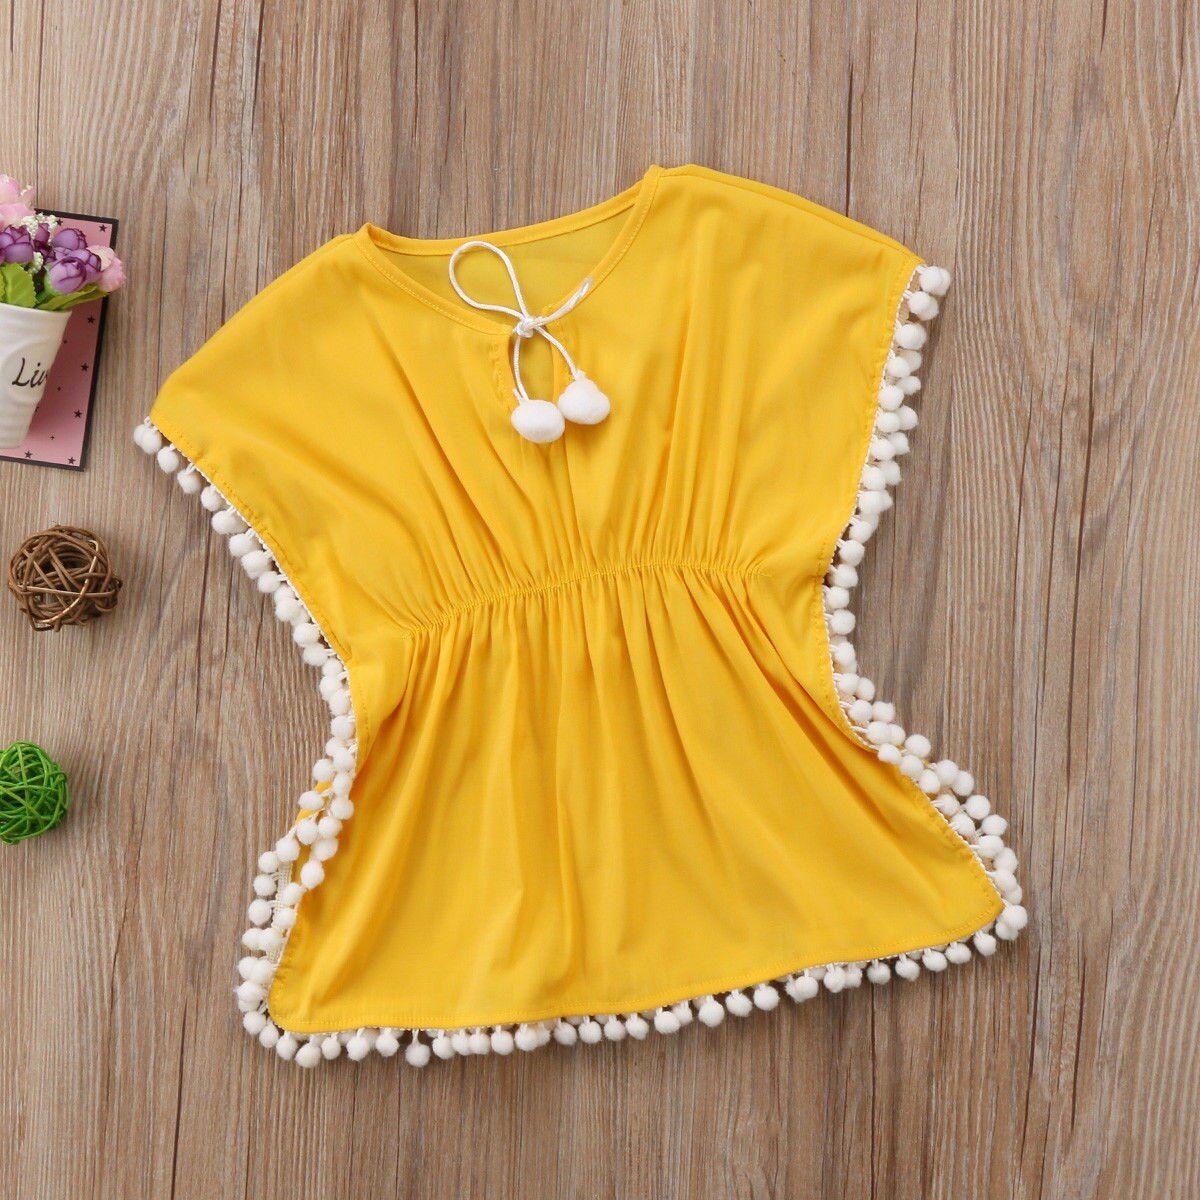 2019 Fashion Kids Baby Girls Dress Beach Sundress Flower Fringe Dresses Bikini Cover 6M-5T – YENİ DİKİŞ FİĶİRLERİ